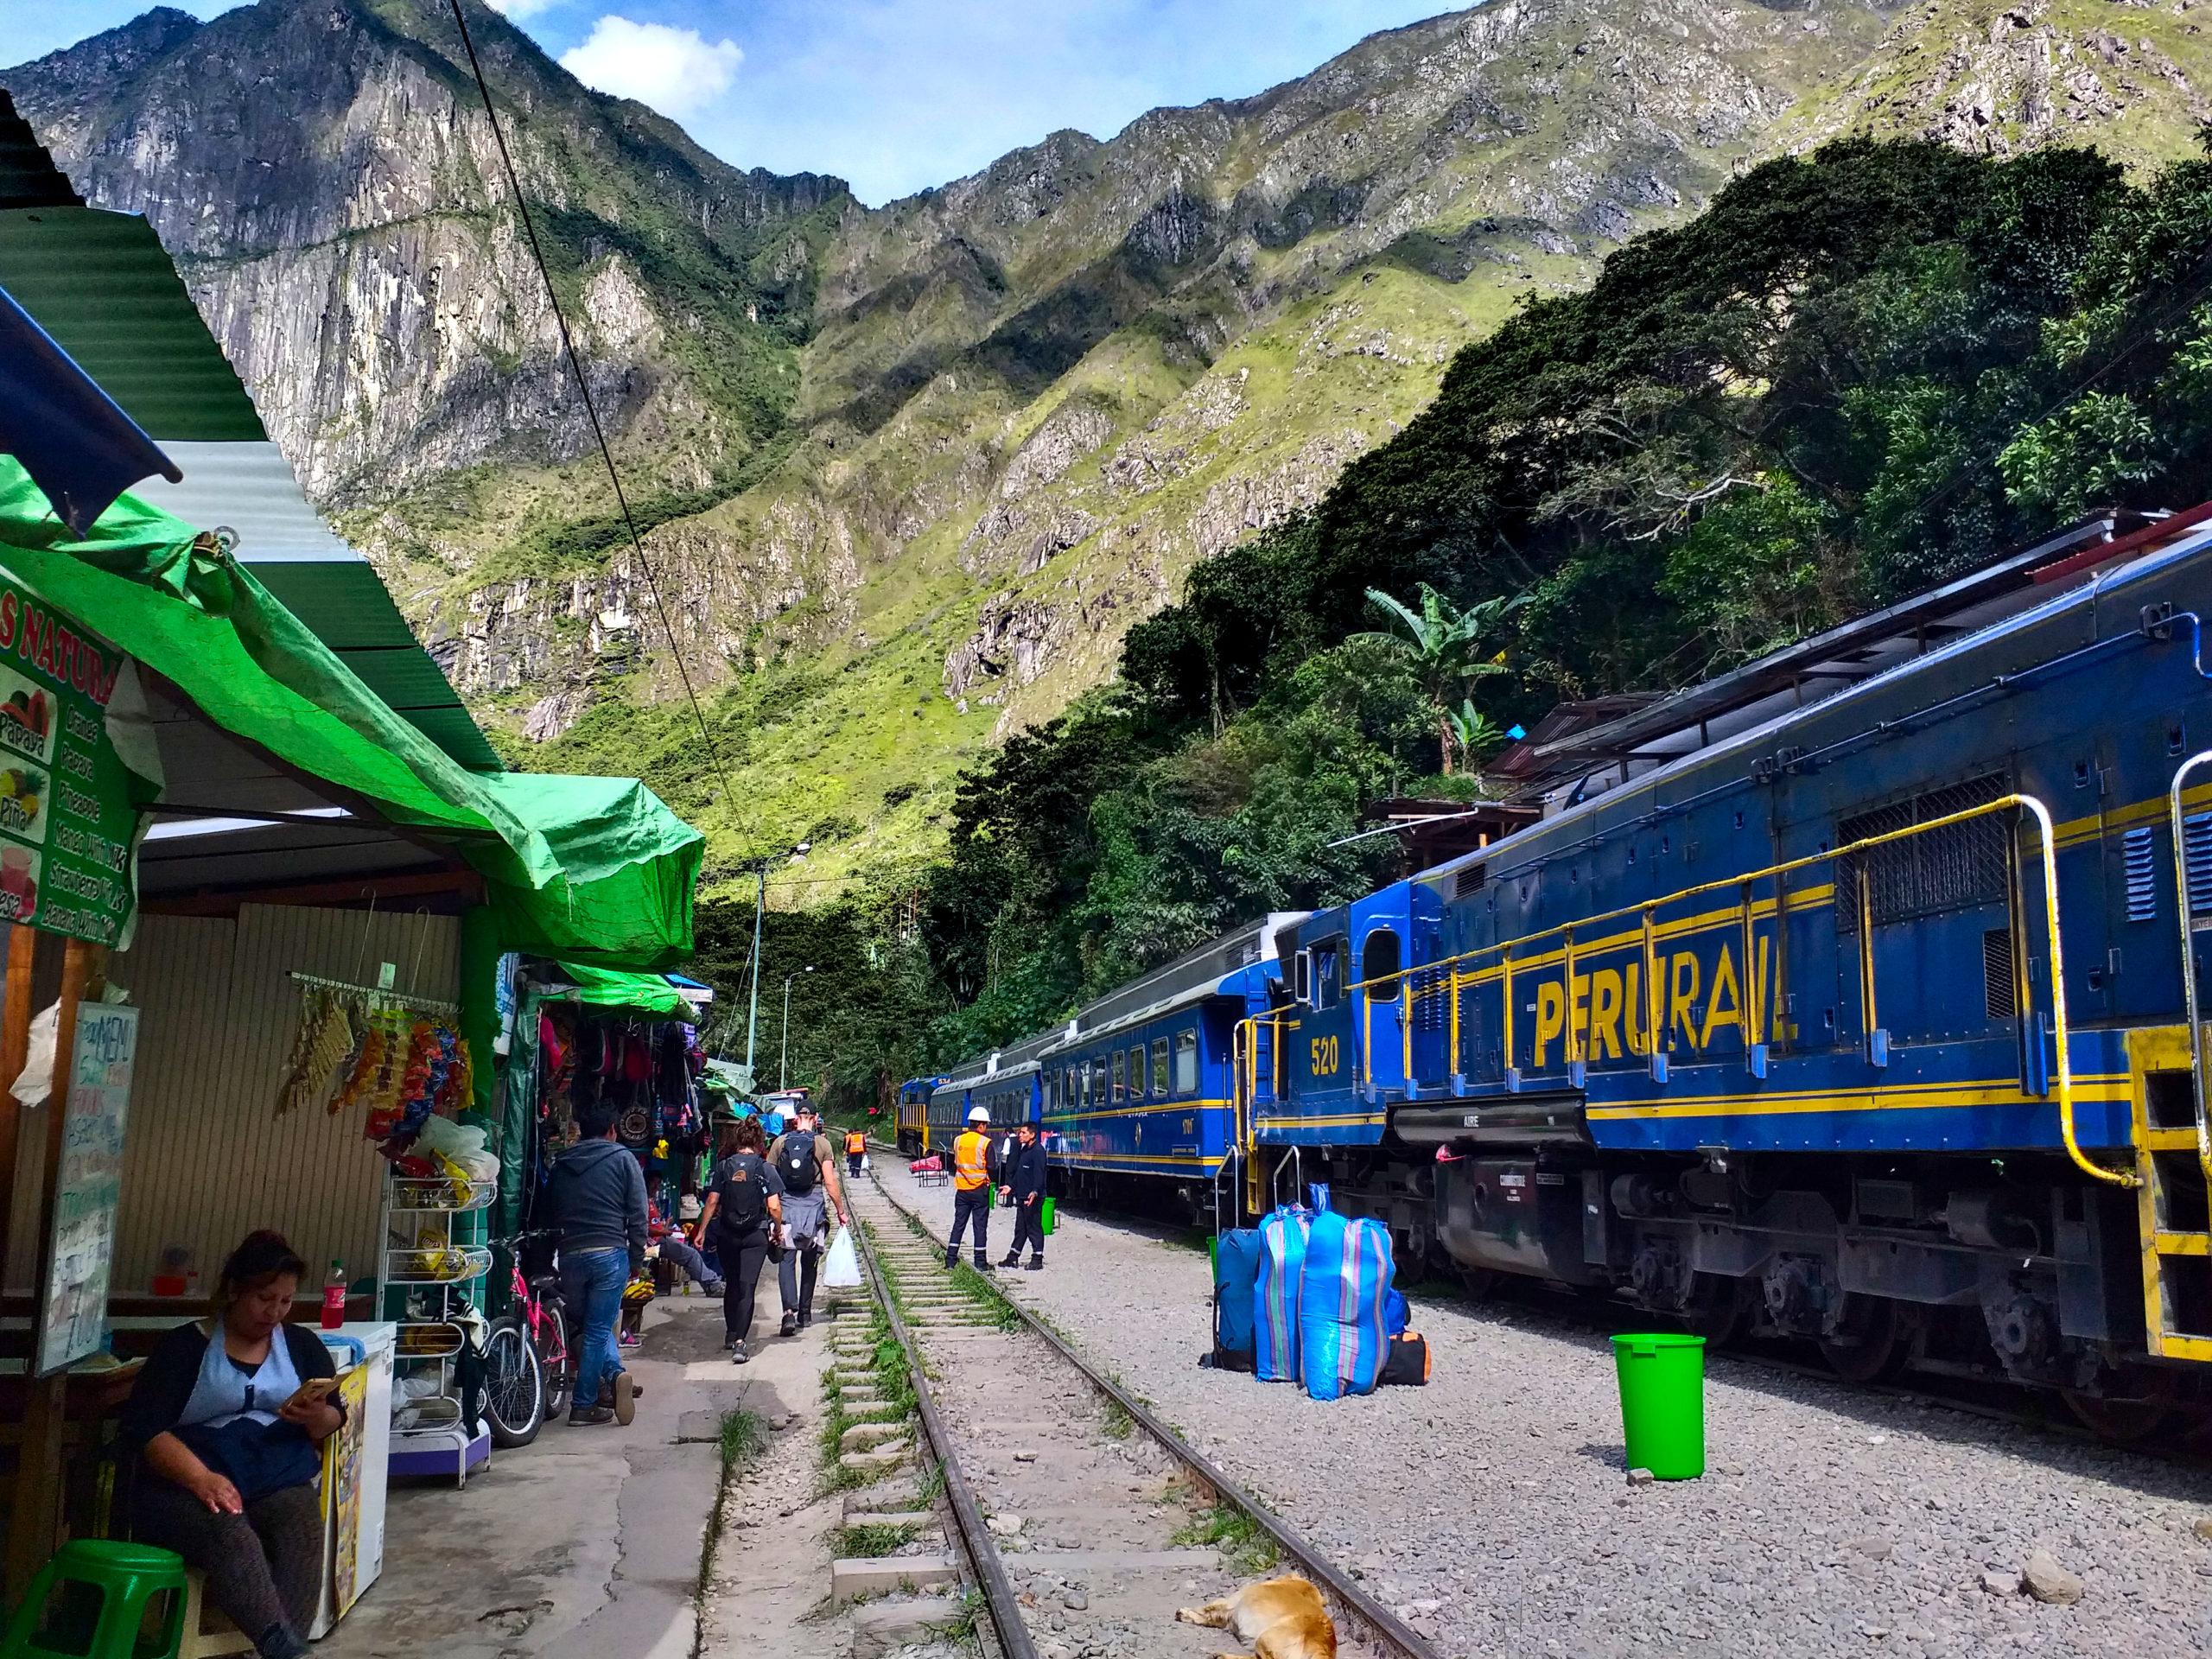 pociąg-peru-rail